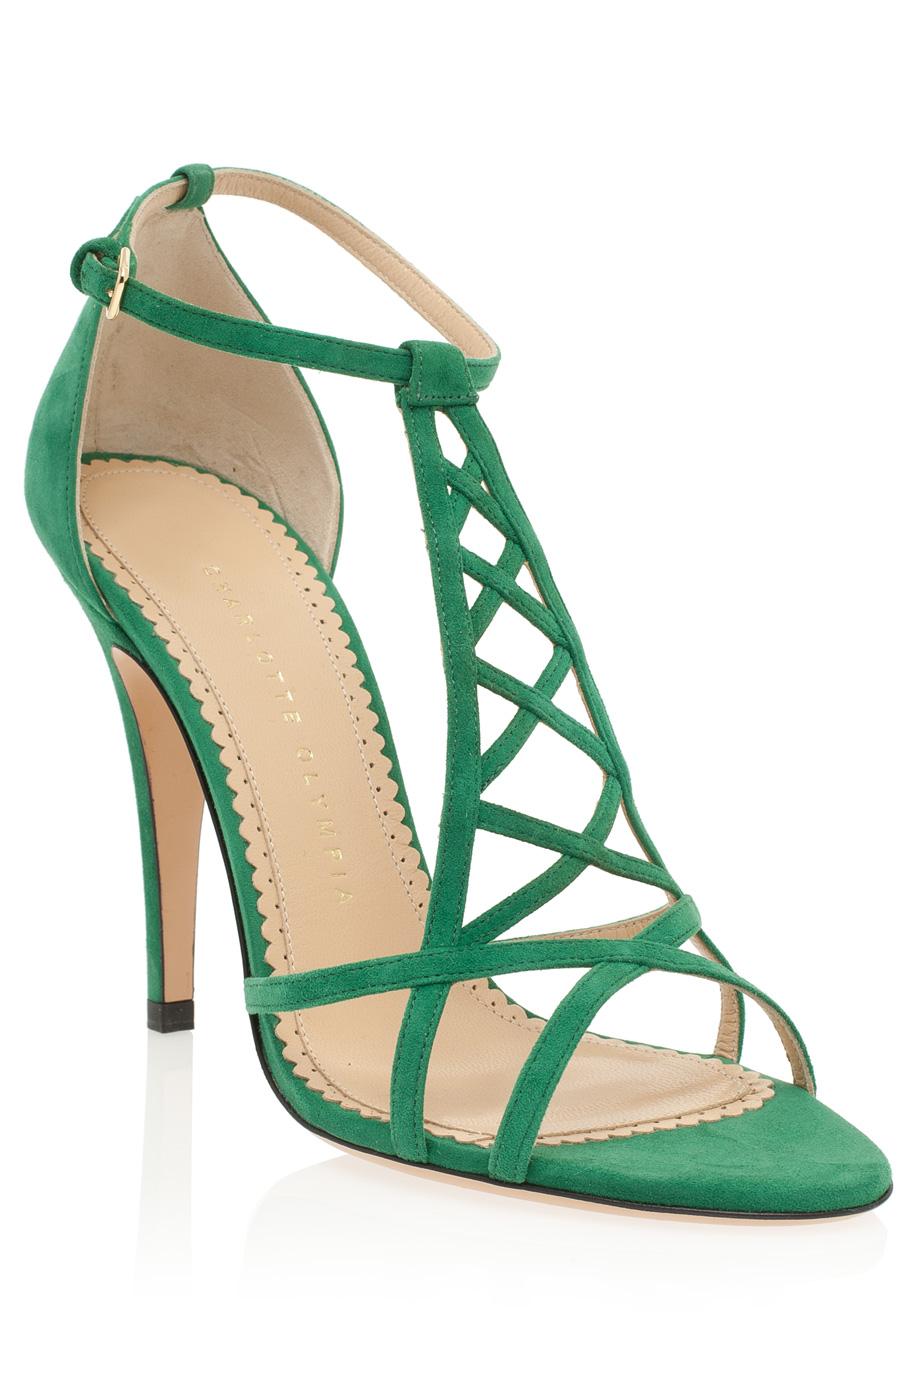 Strappy Green Heels